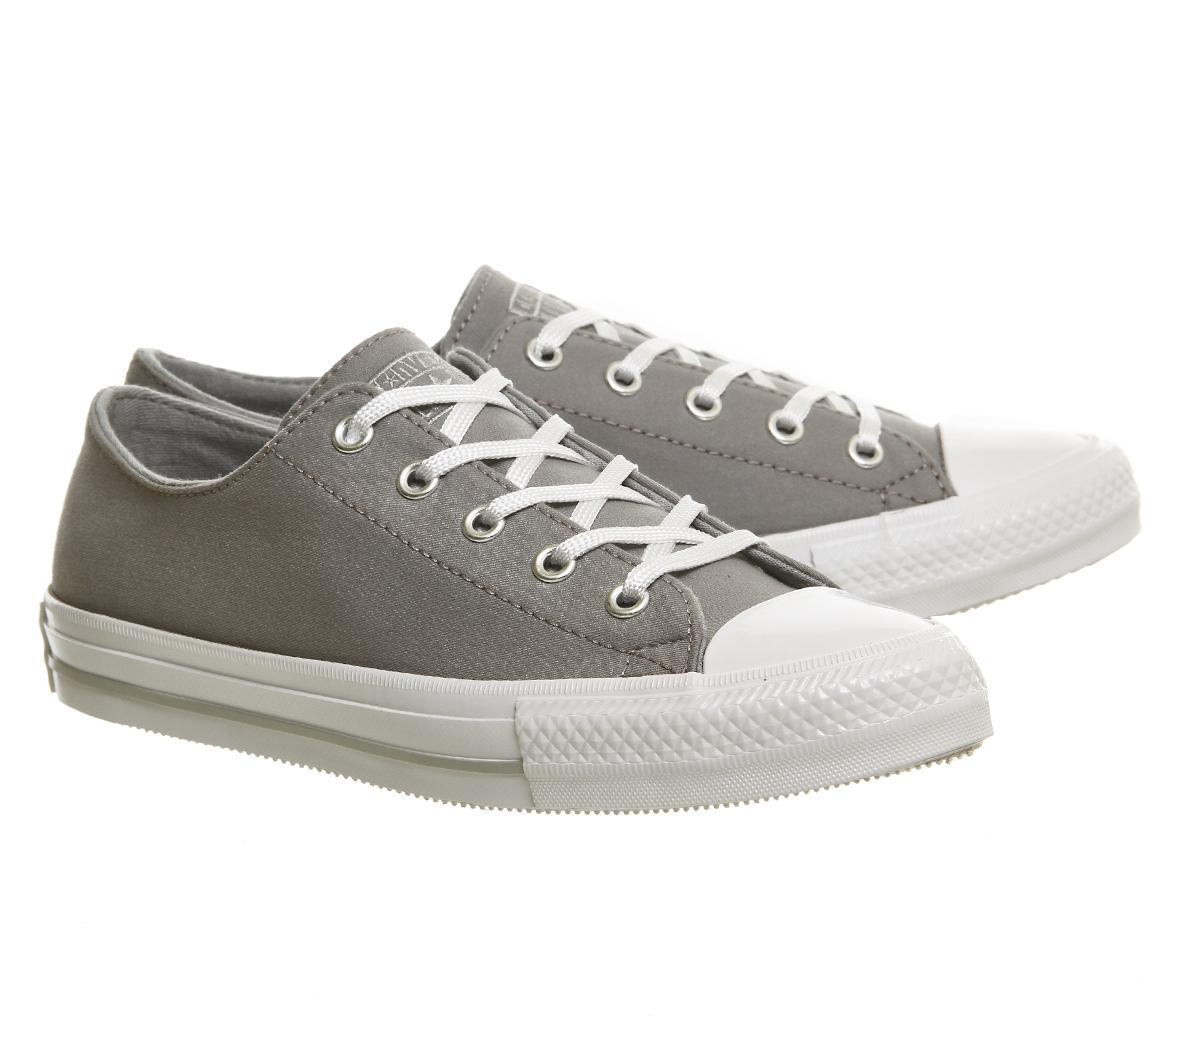 Converse Ctas Gemma Low Canvas in Grey White (Grey) for Men